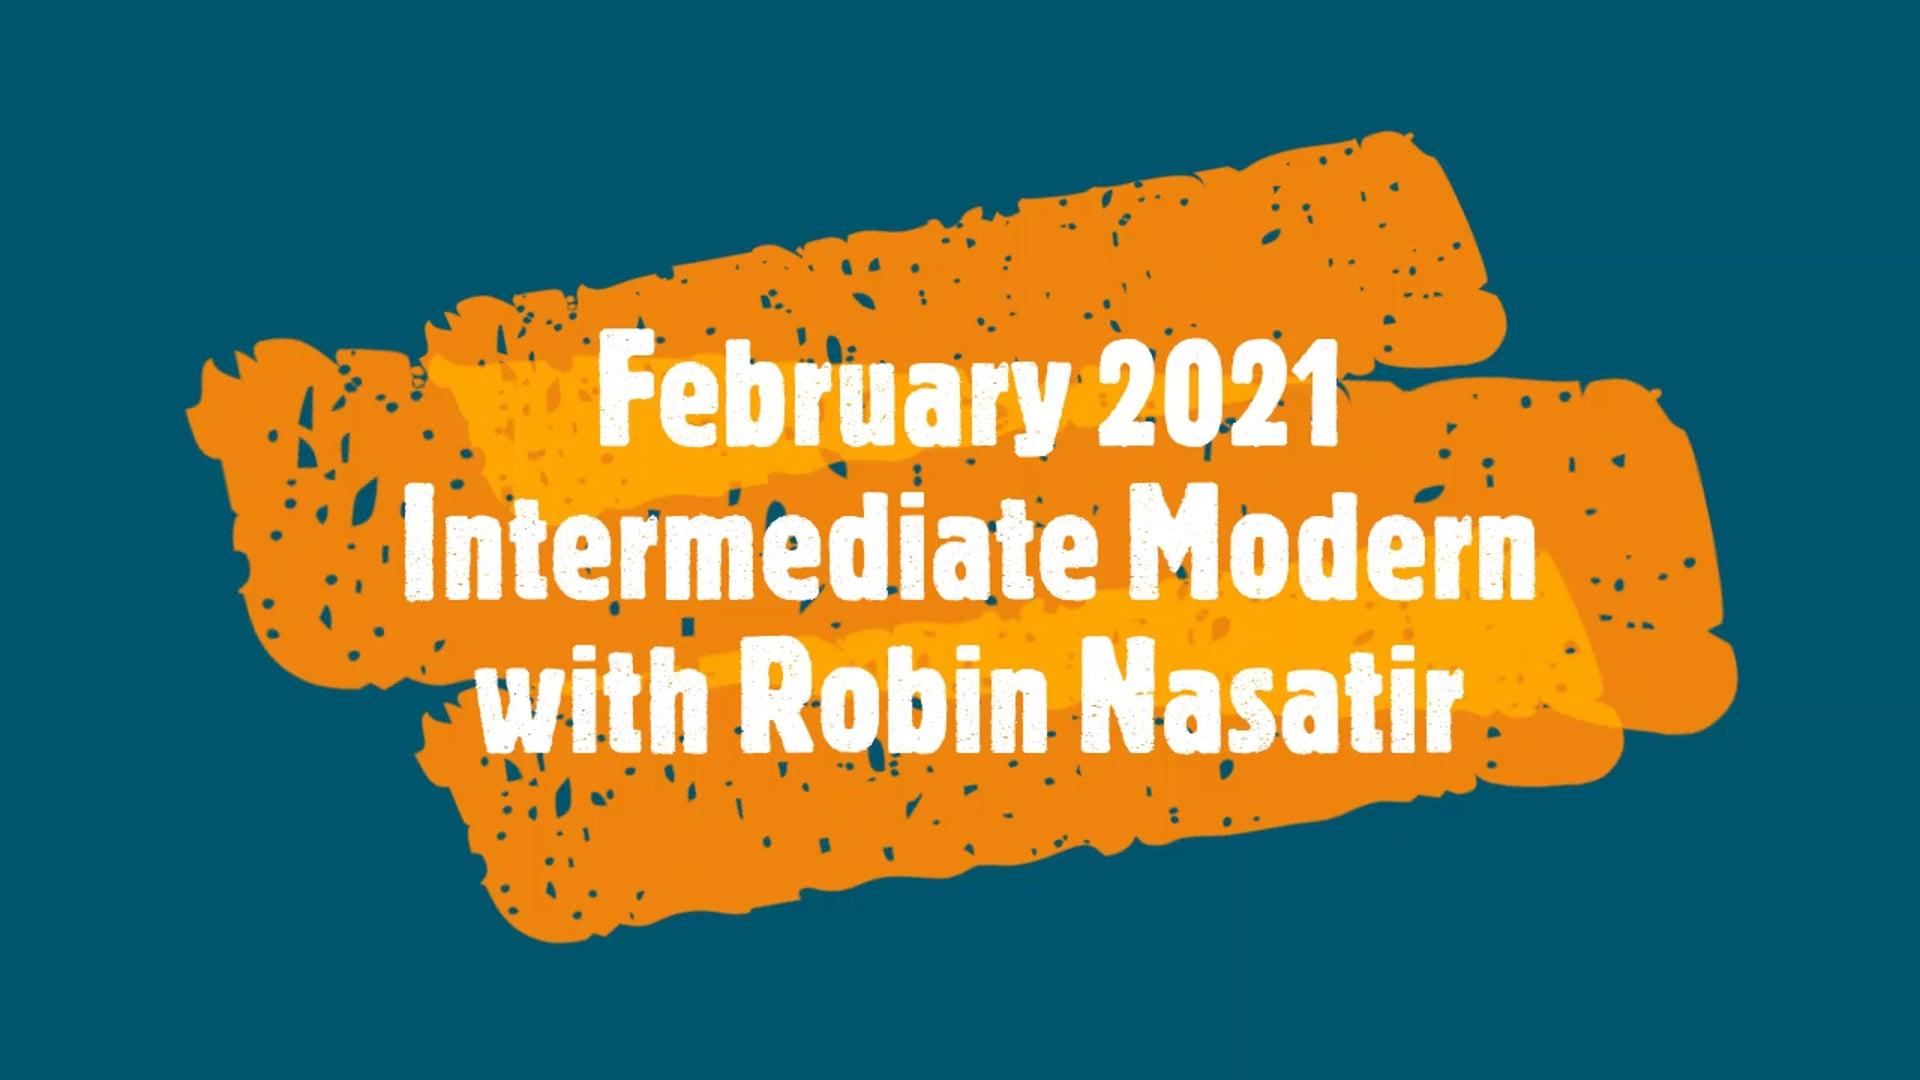 February 2021 Intermediate Modern Dance